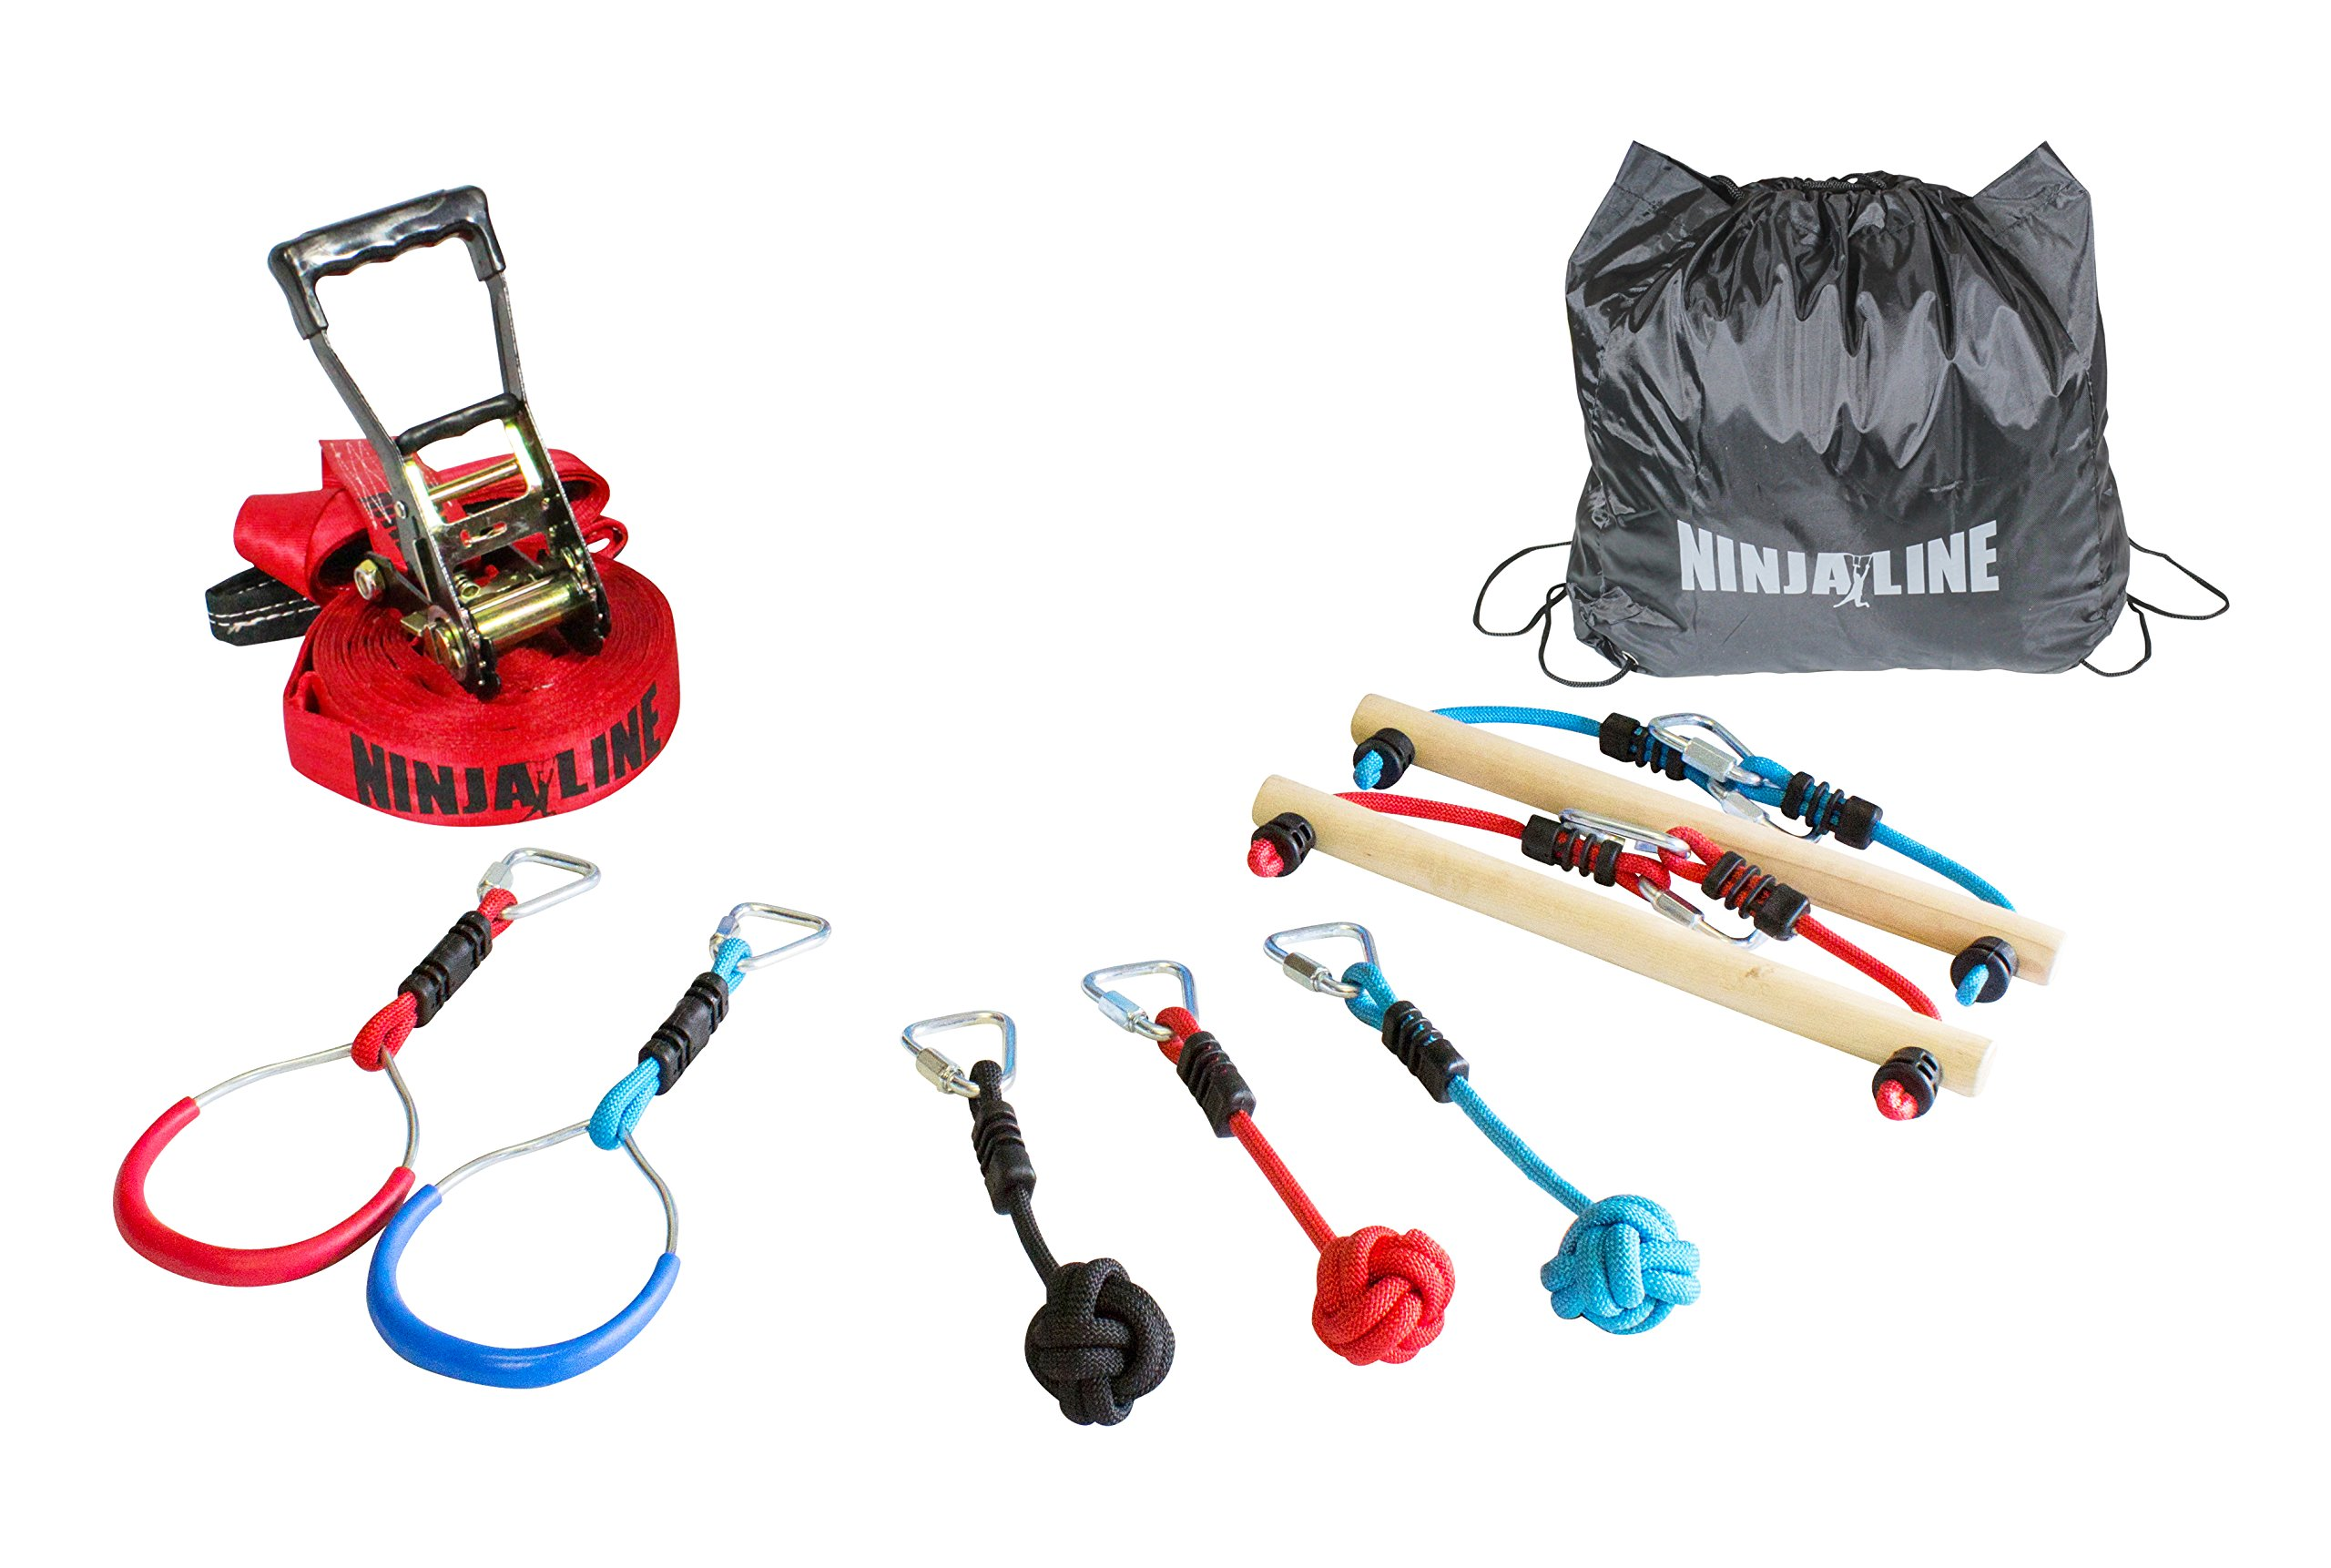 56' Ninjaline Intro Kit by Slackers